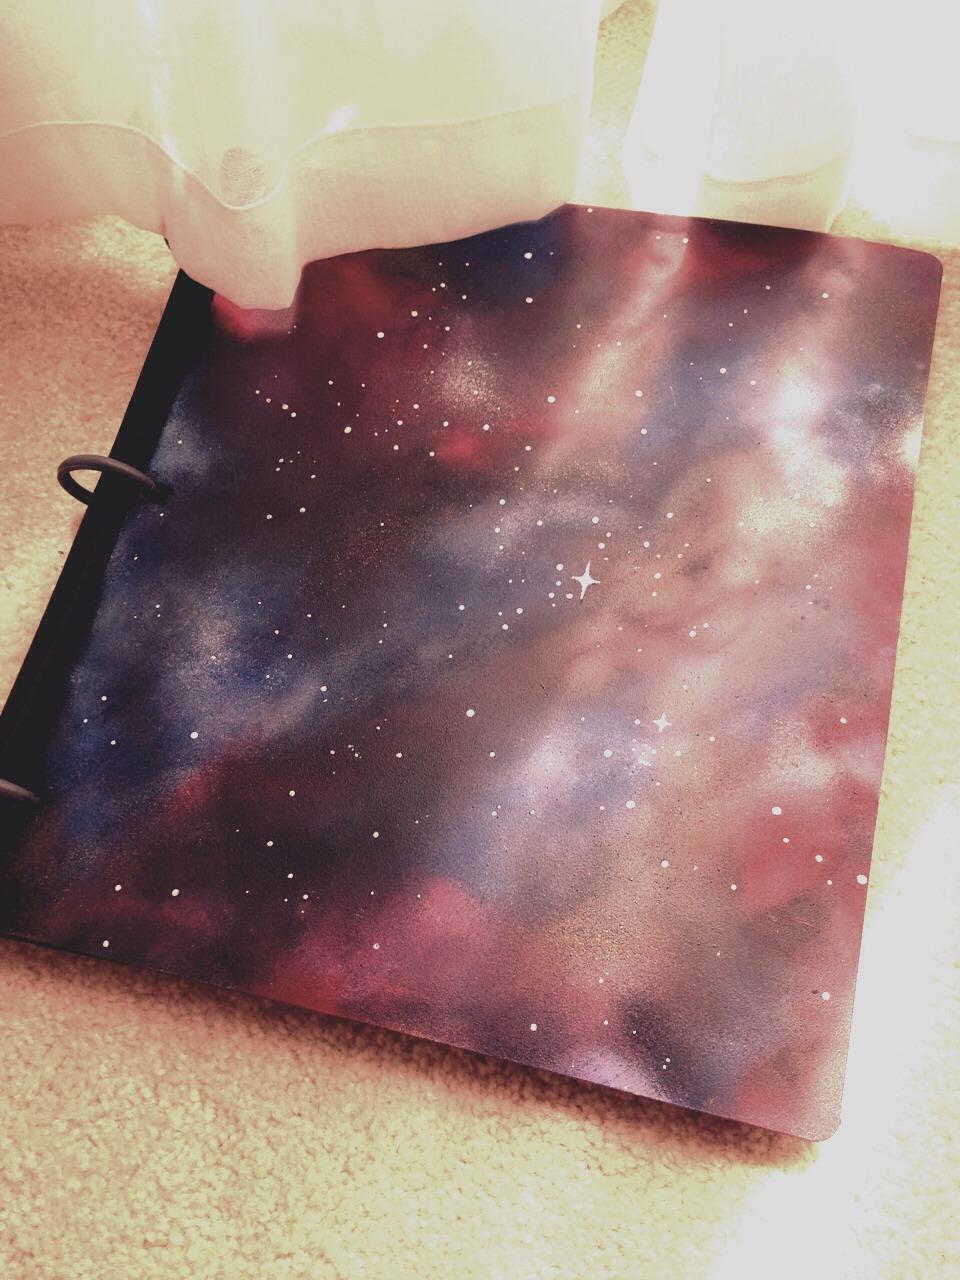 Diy Galaxy Book Cover : Diy galaxy book cover prepare for compliments trusper